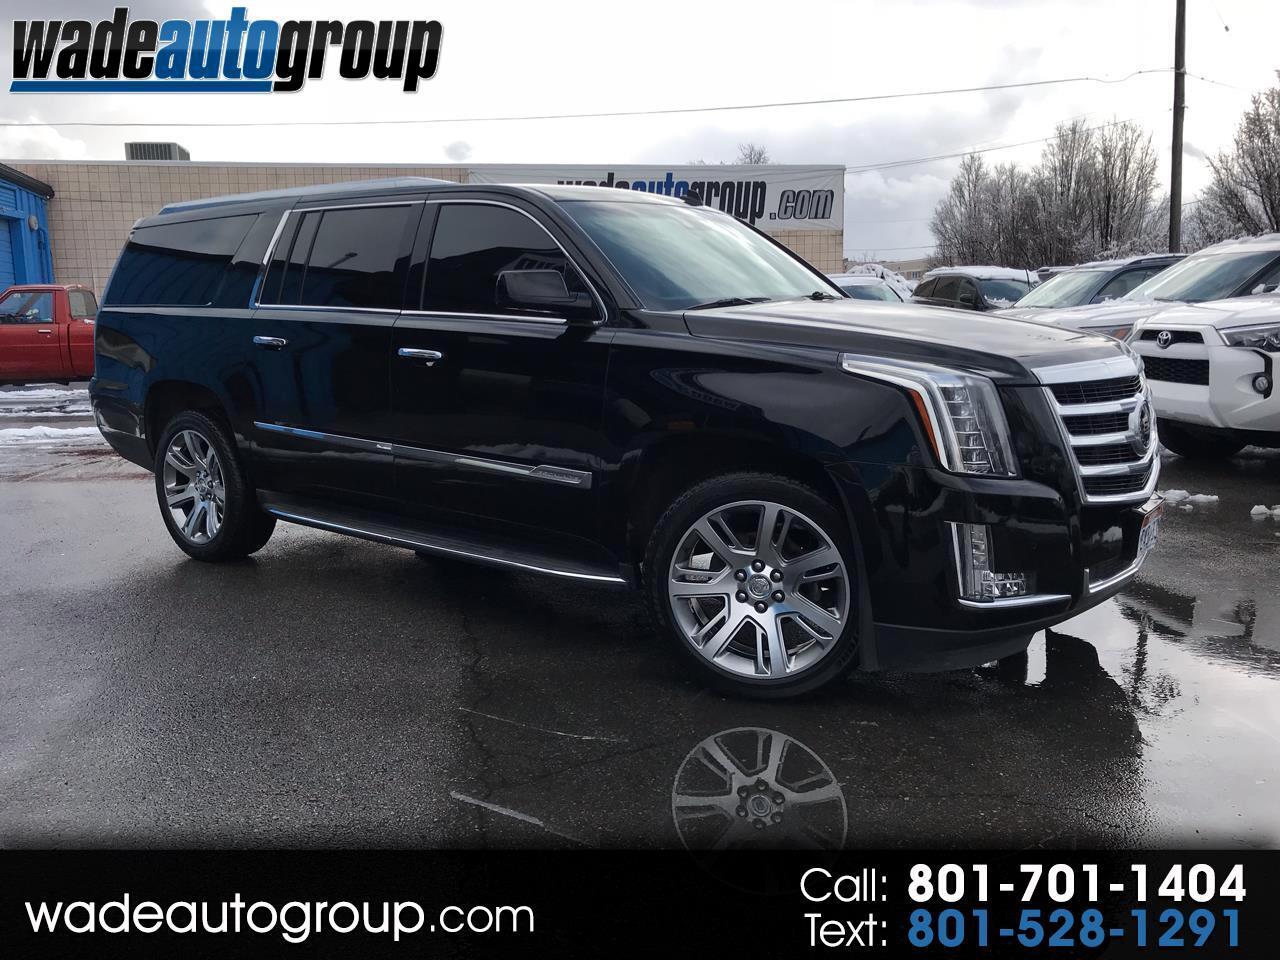 2015 Cadillac Escalade ESV Premium 4WD